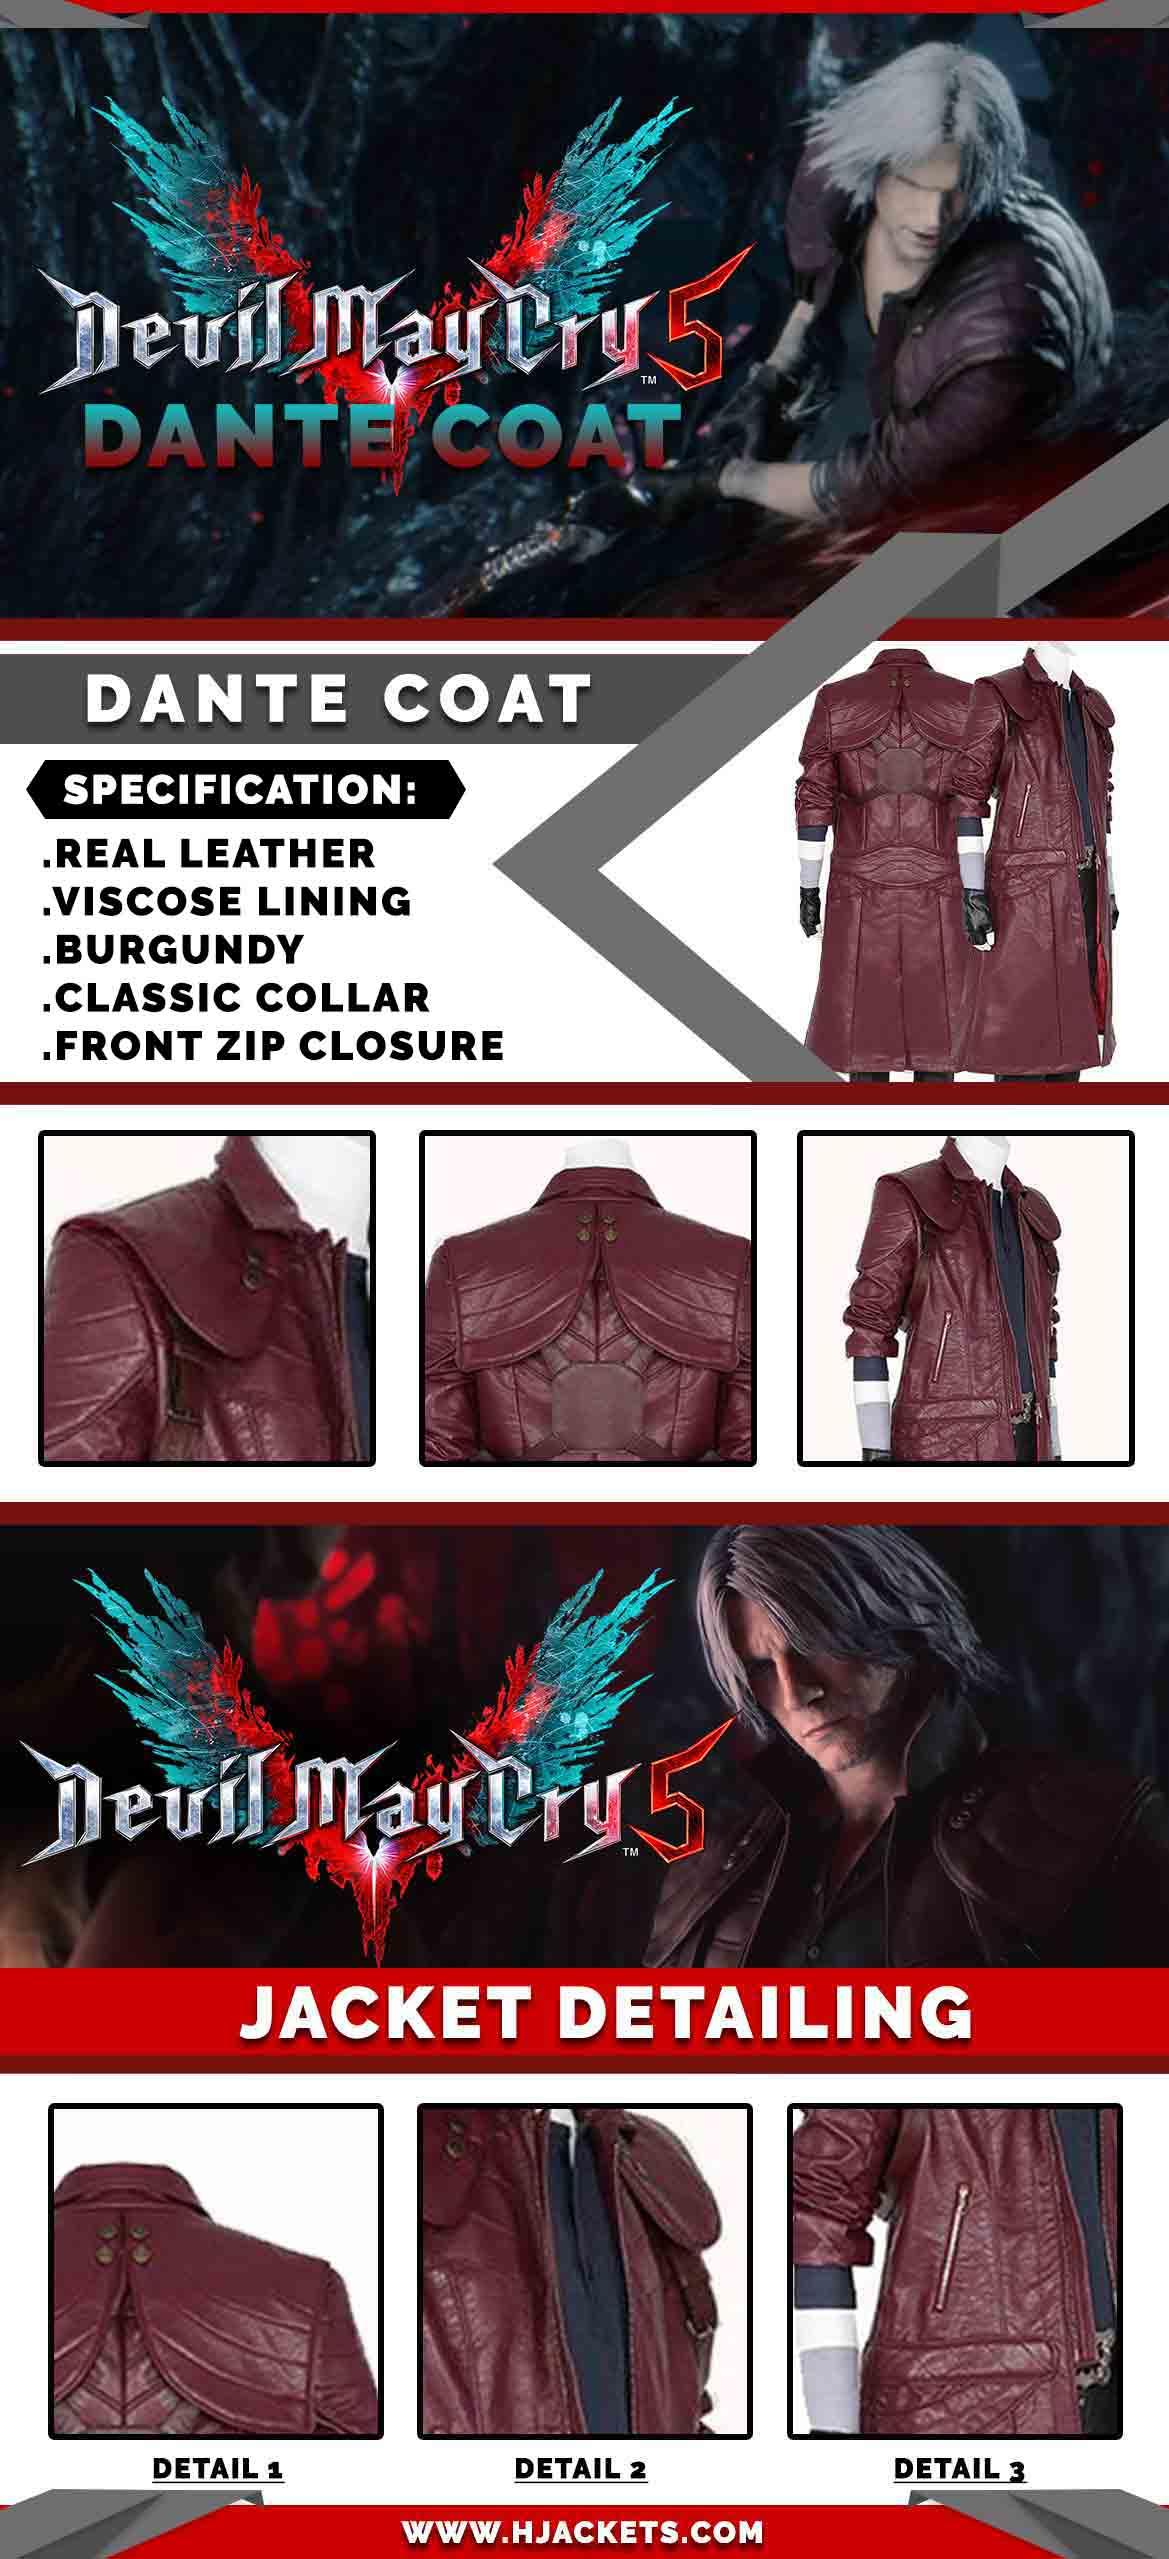 dante coat Infogrphic